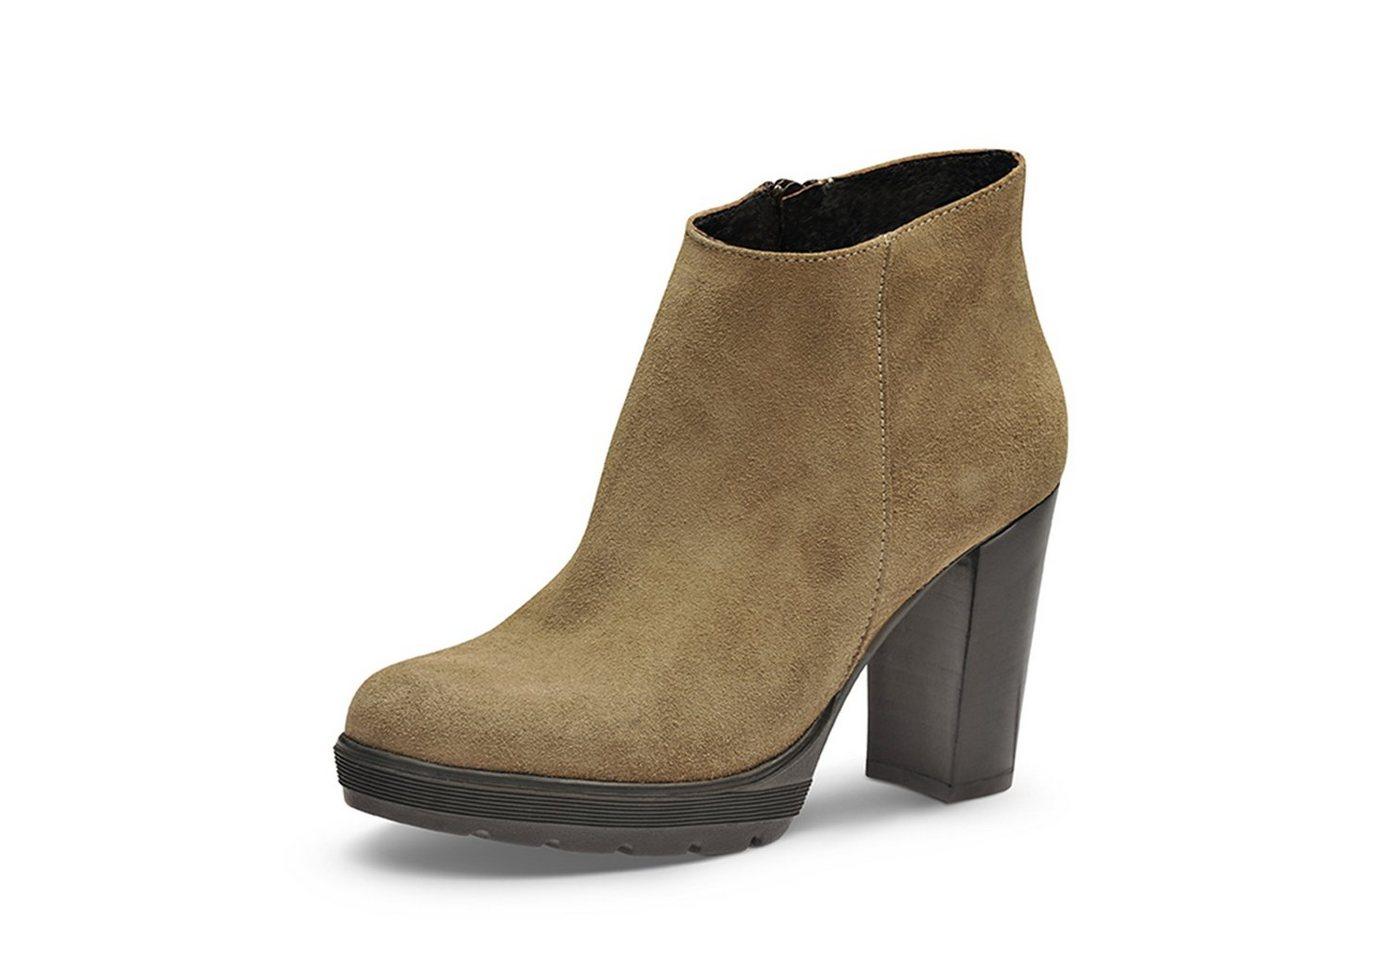 Evita »UBALDA« Plateaustiefelette   Schuhe > Stiefeletten > Plateaustiefeletten   Leder   Evita